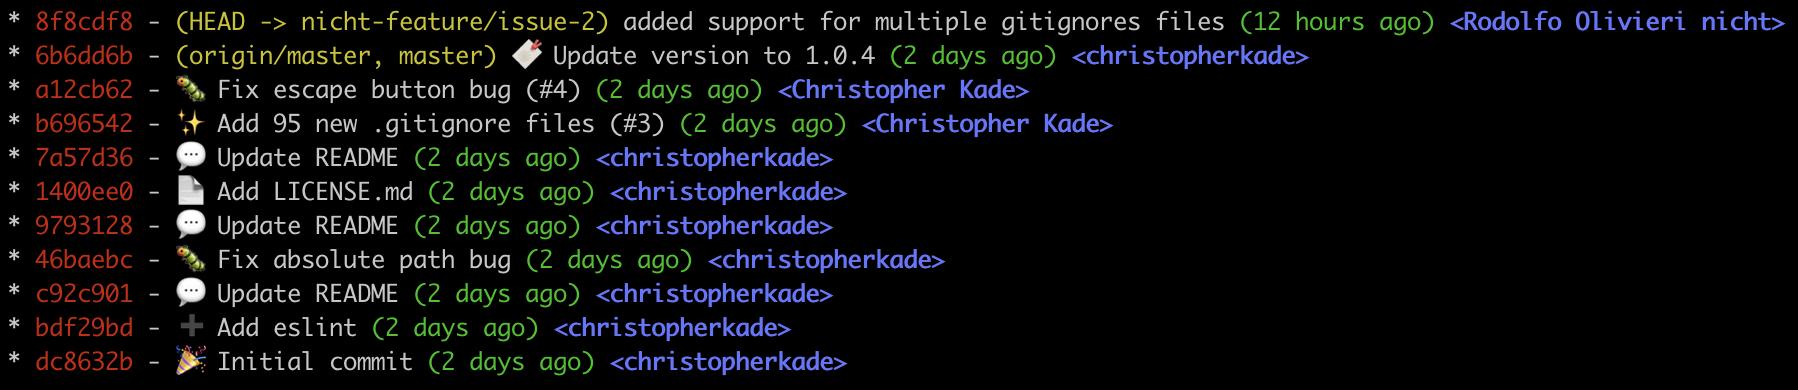 git log screenshot 2